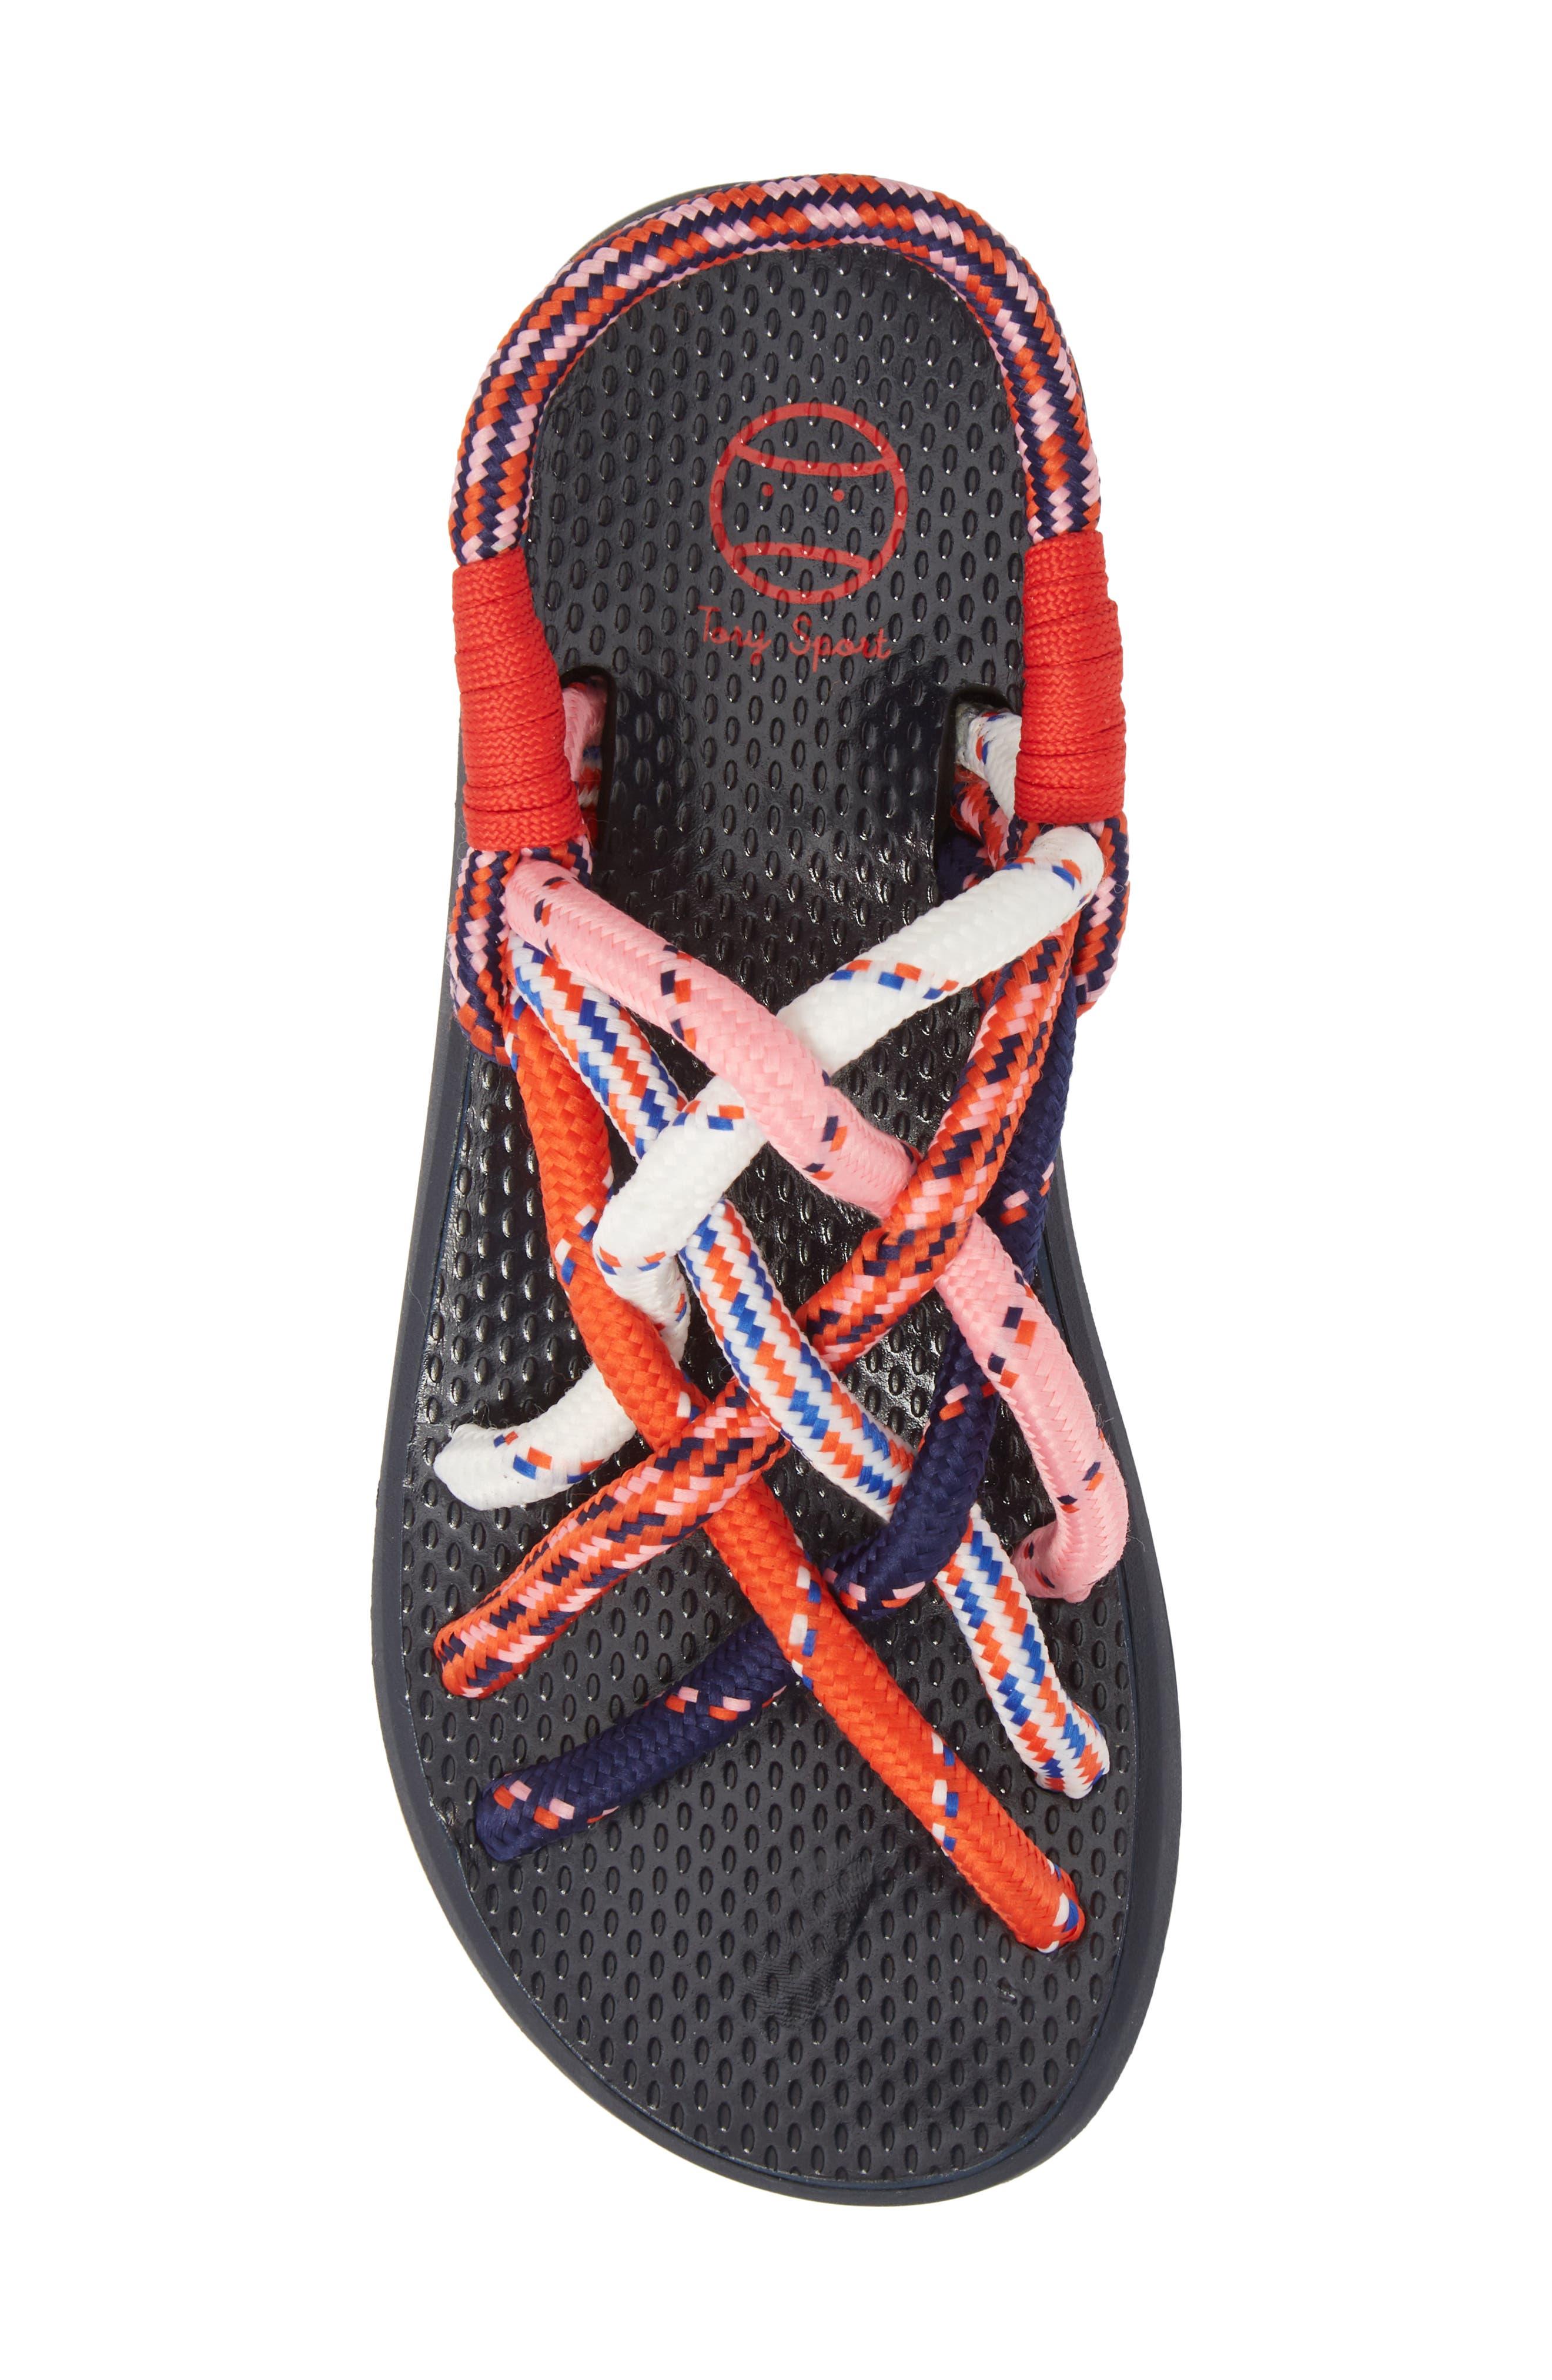 Rope Sandal,                             Alternate thumbnail 5, color,                             Red Multi